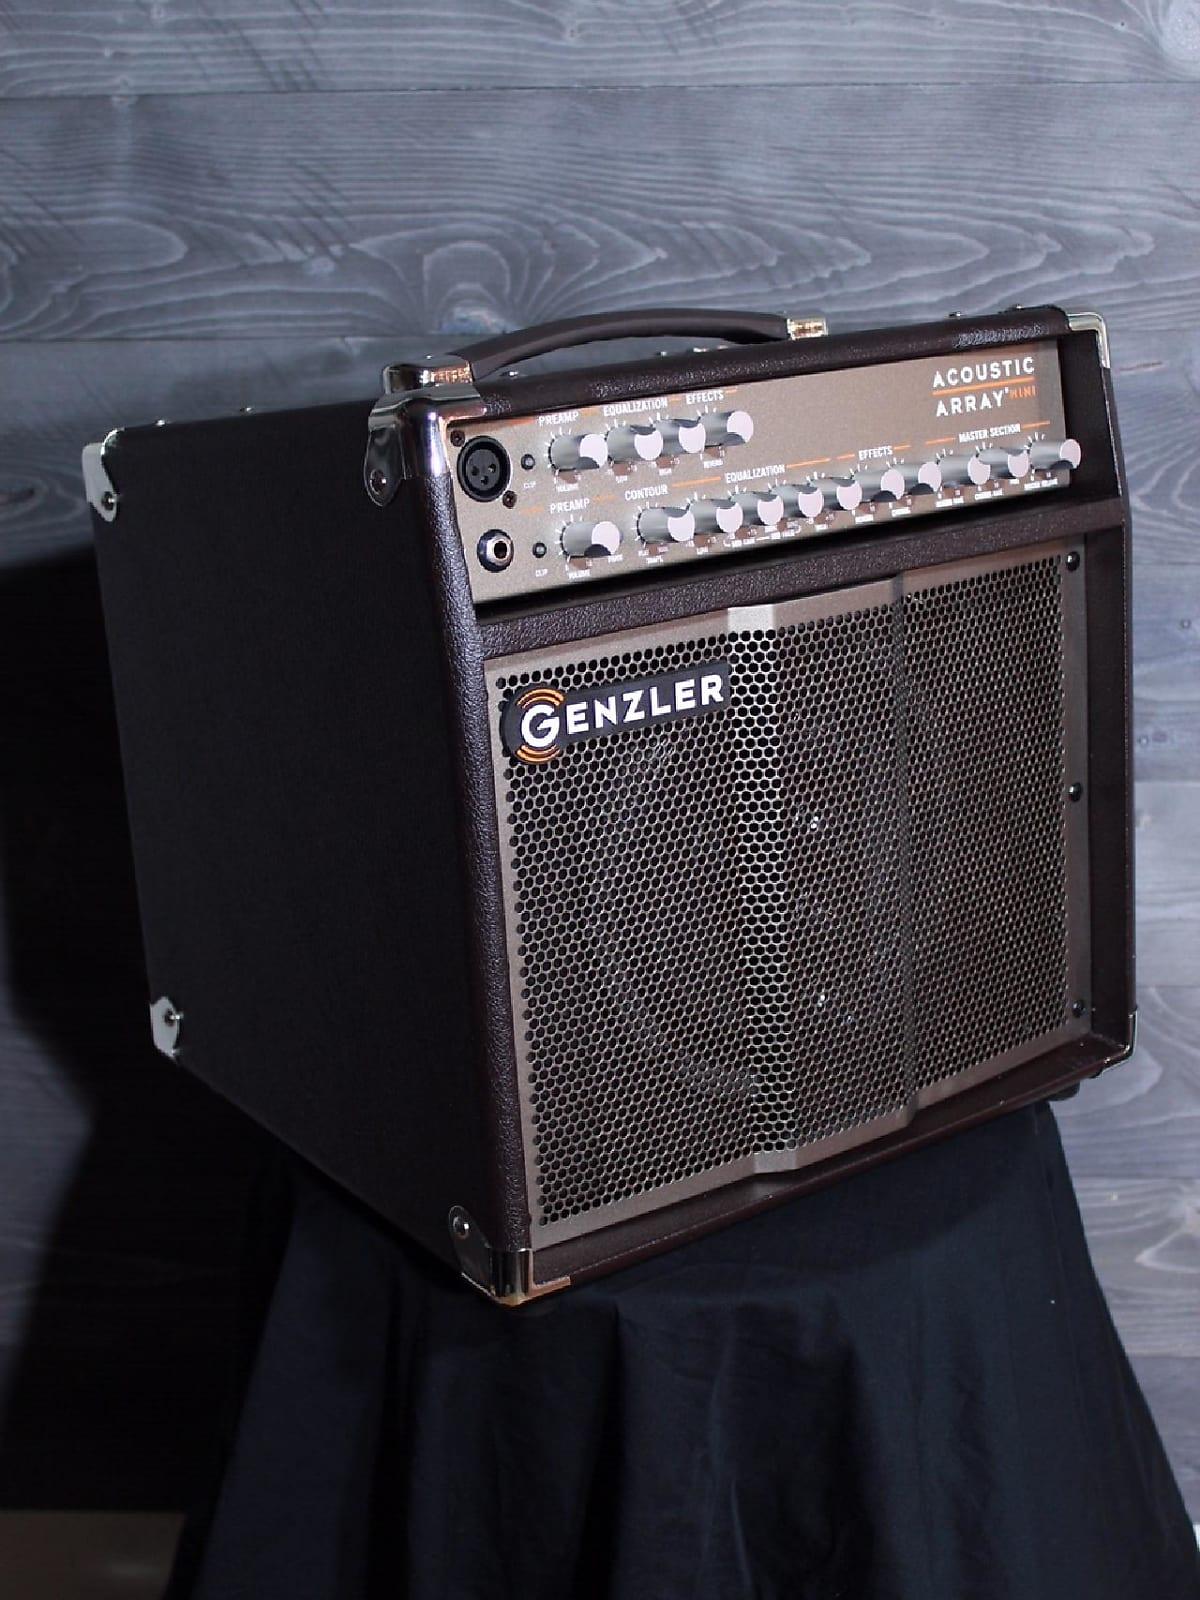 Genzler Amplification Acoustic Array Mini